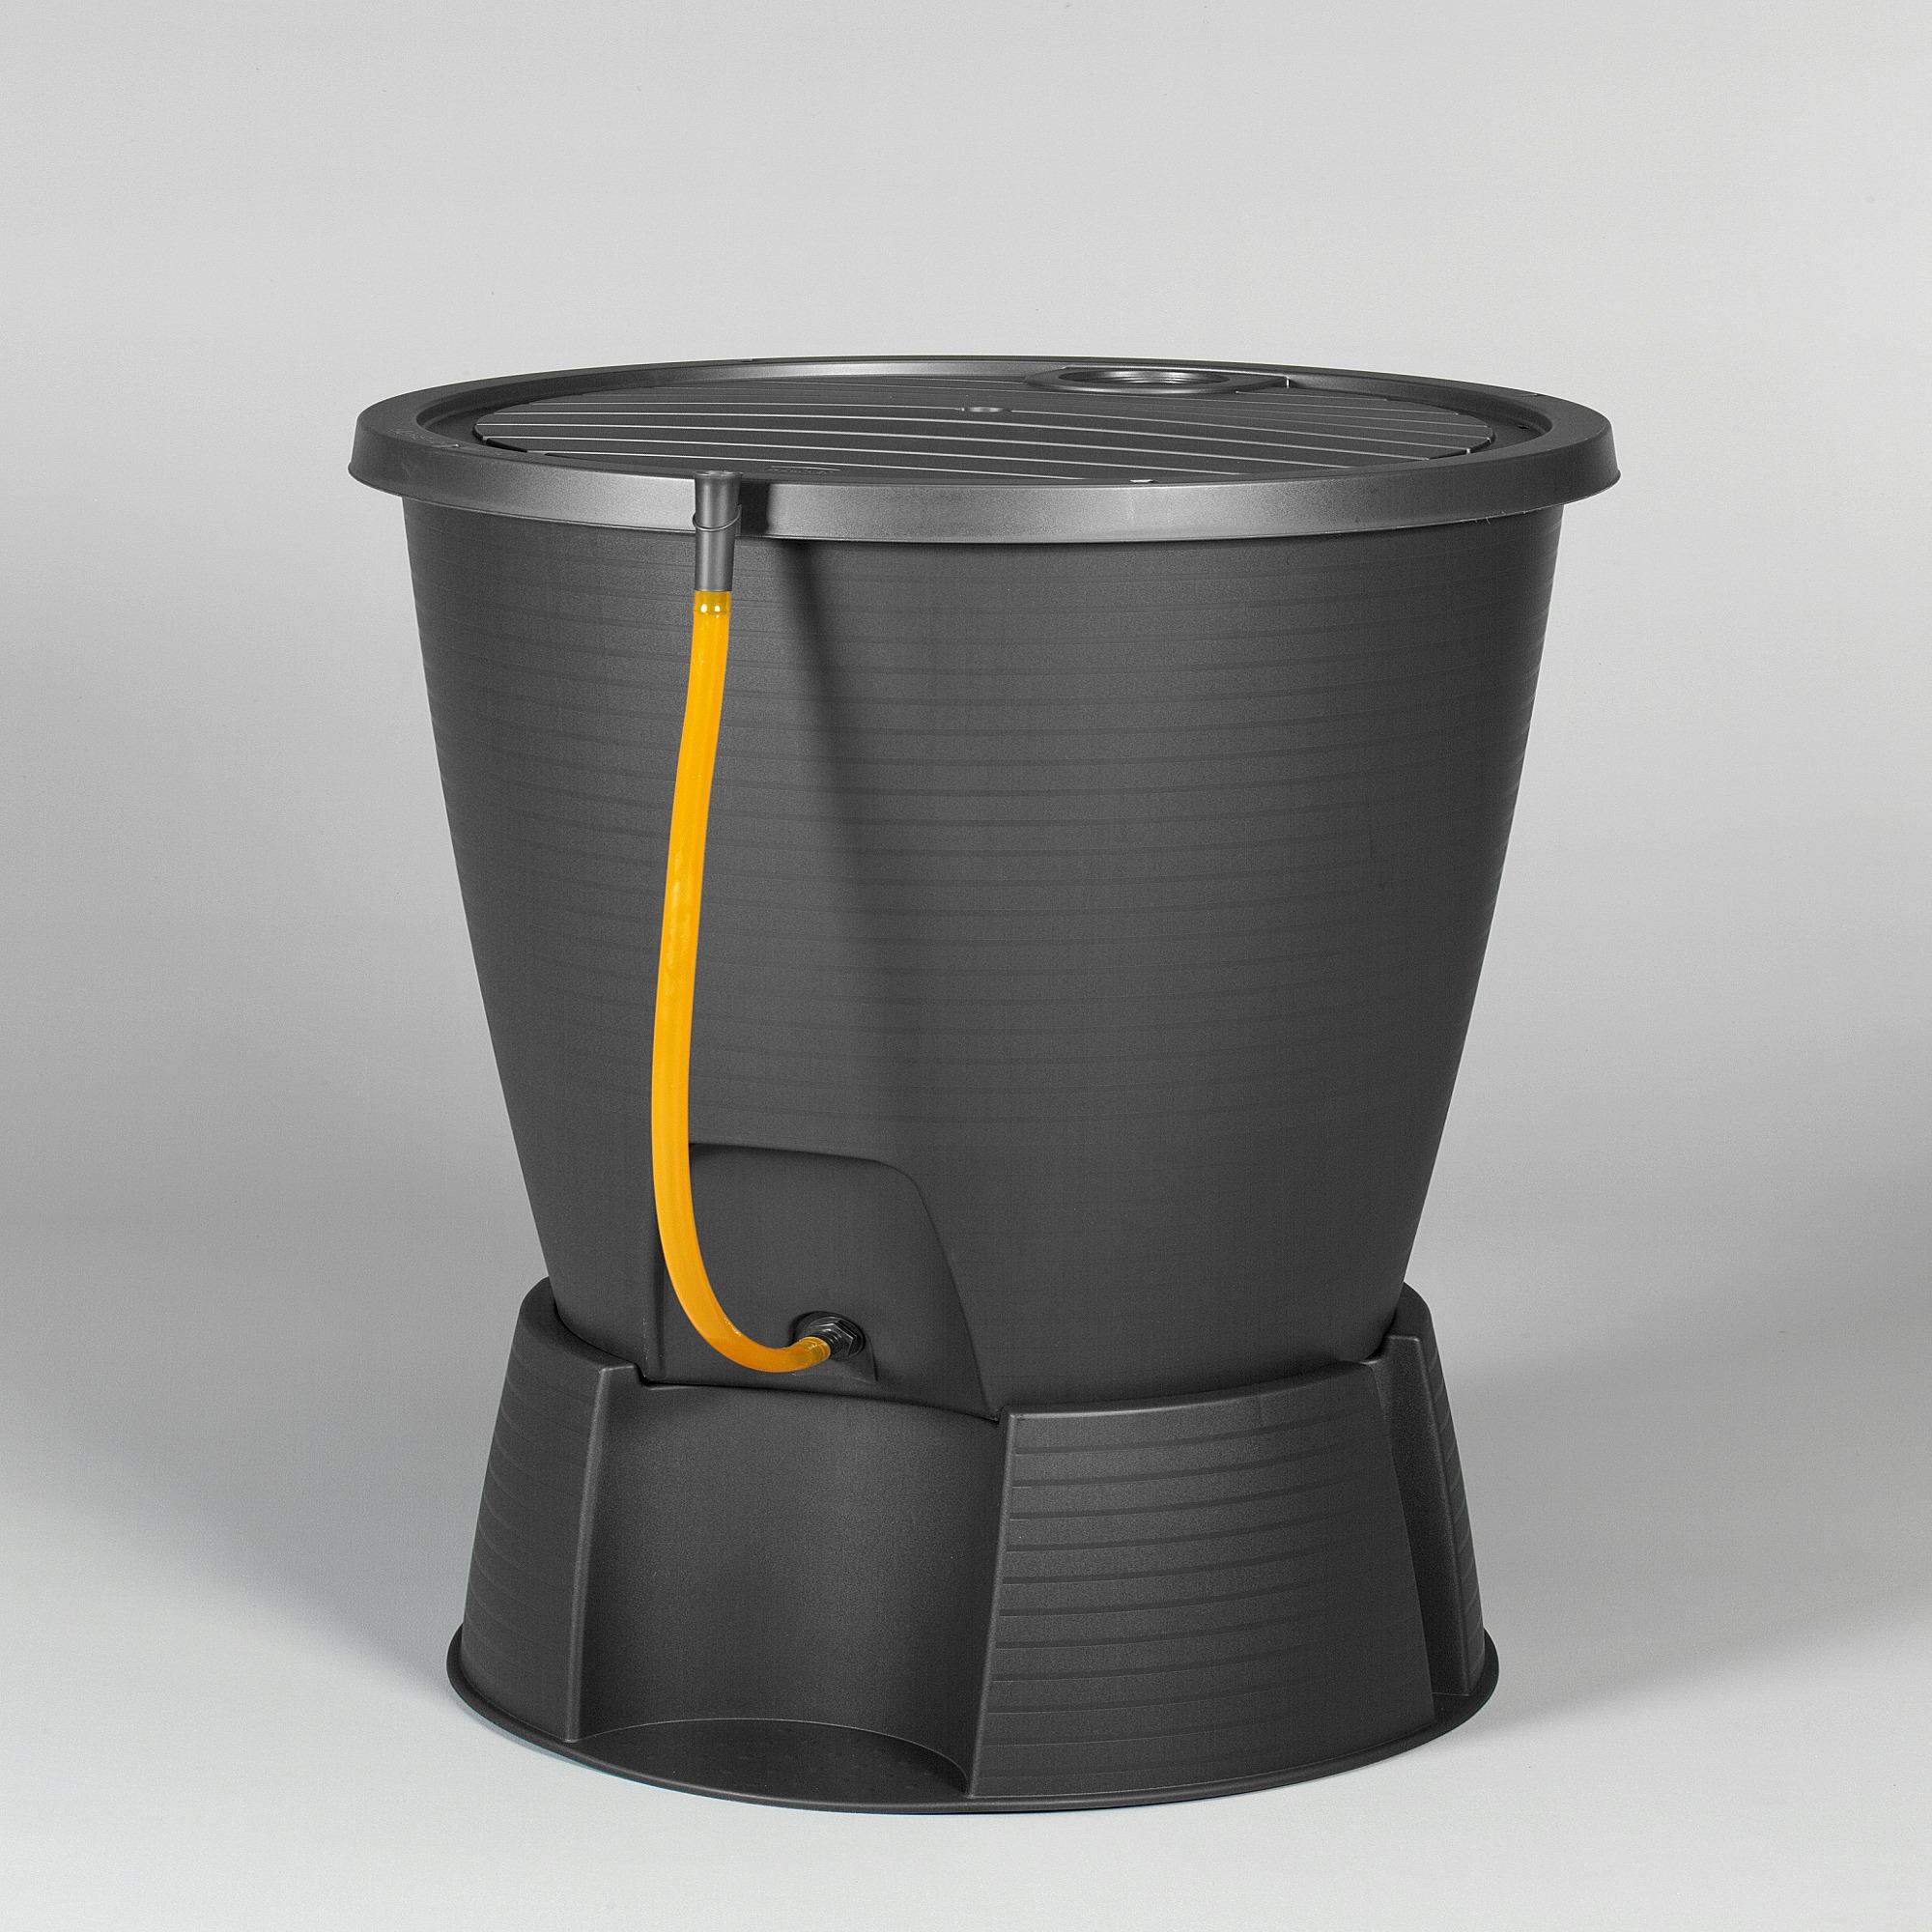 tonneau de pluie indigo jardin 220 l arrosage pompes. Black Bedroom Furniture Sets. Home Design Ideas